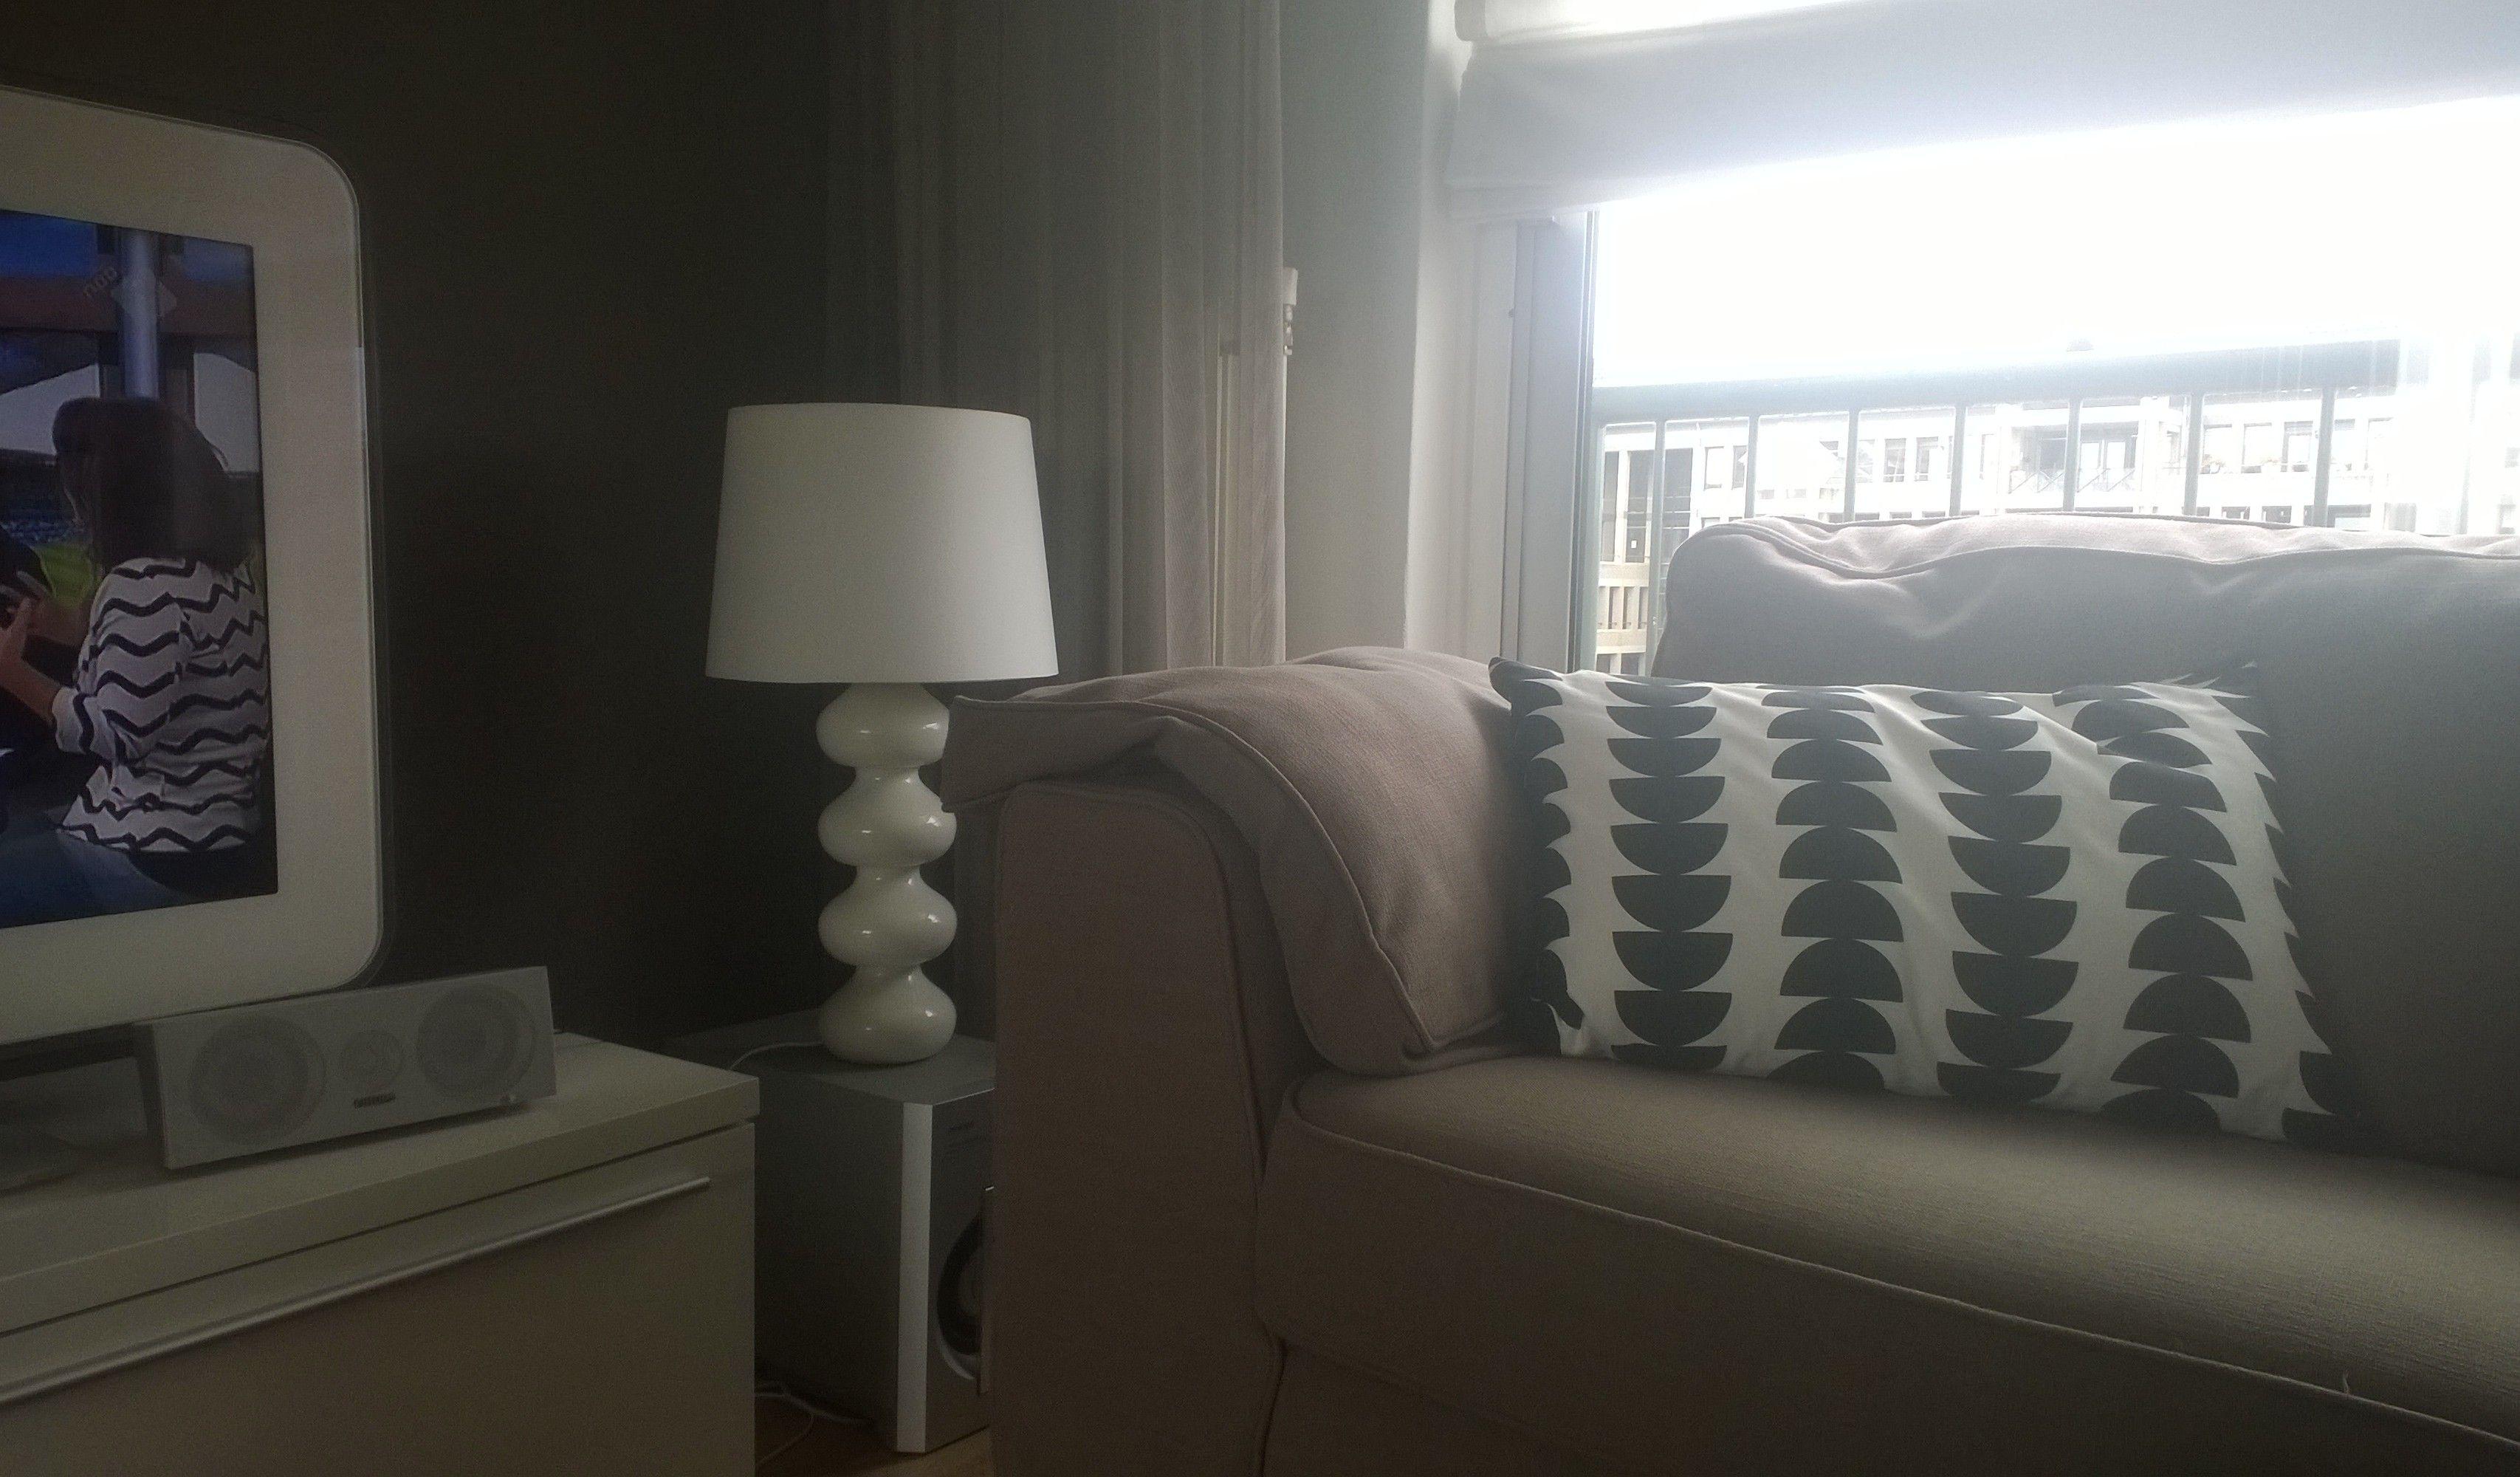 Speelse Interieur Inrichting : De speelse en toch trendy bubbly schemer lamp interieur